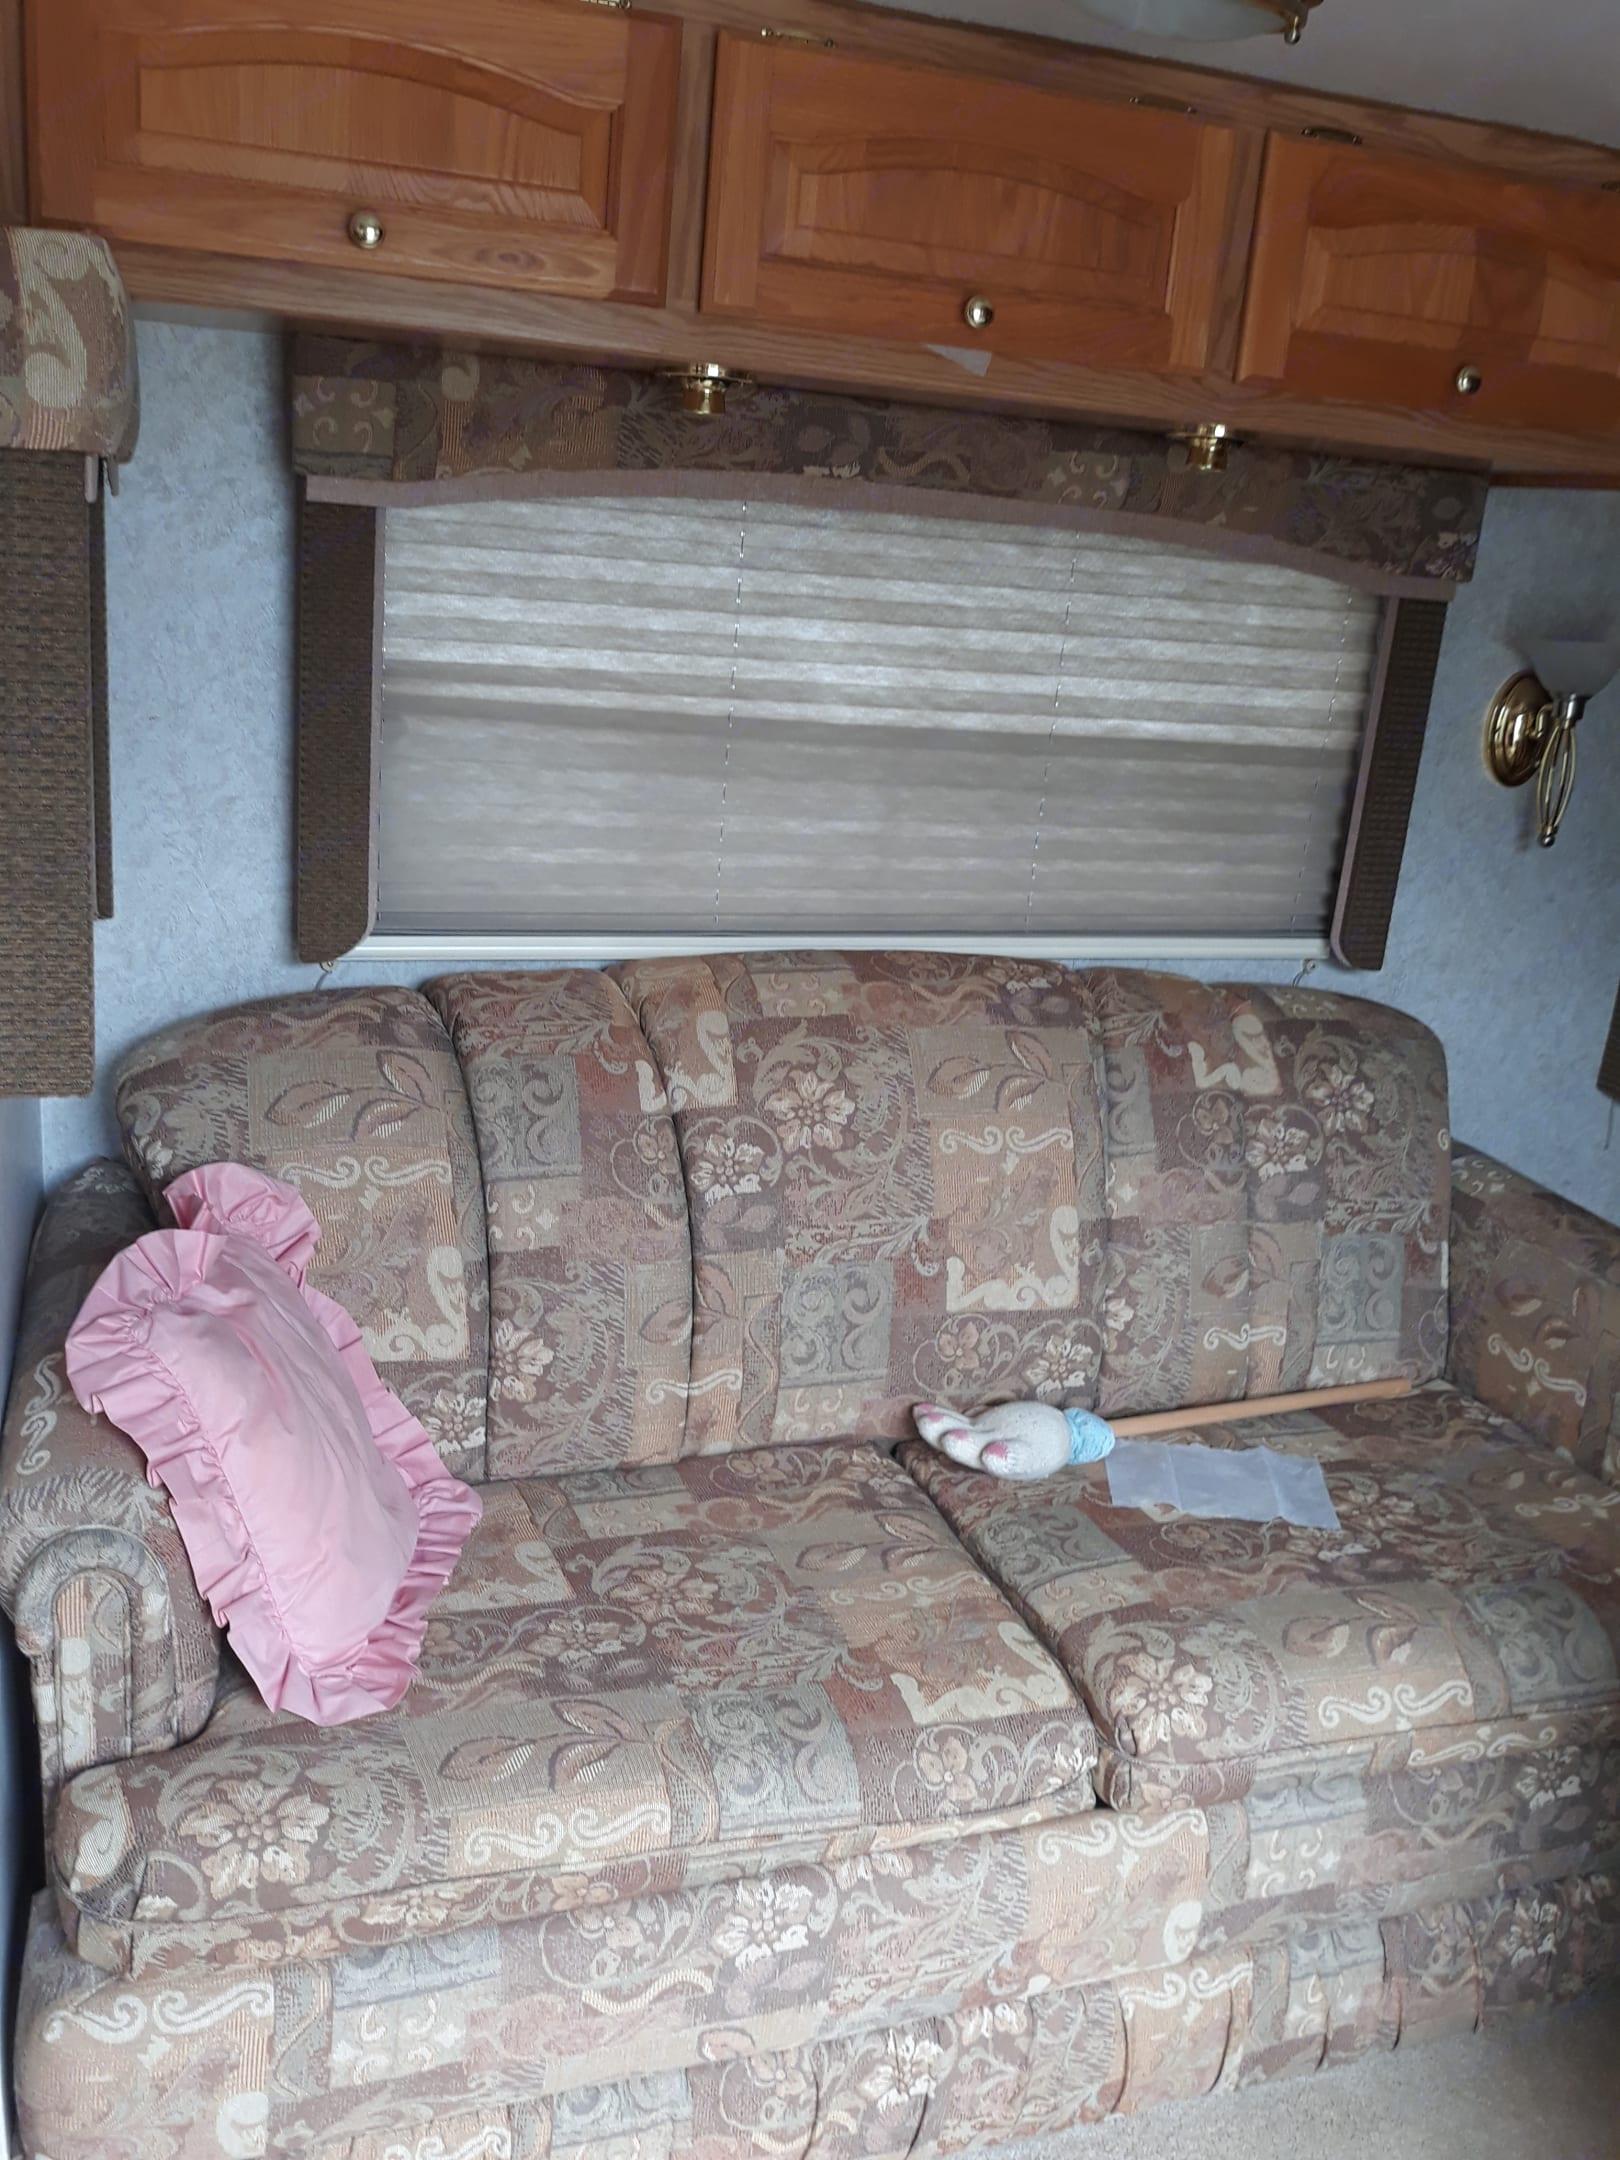 Couch, that pulls out u. Ameri-Camp 290rls 2004